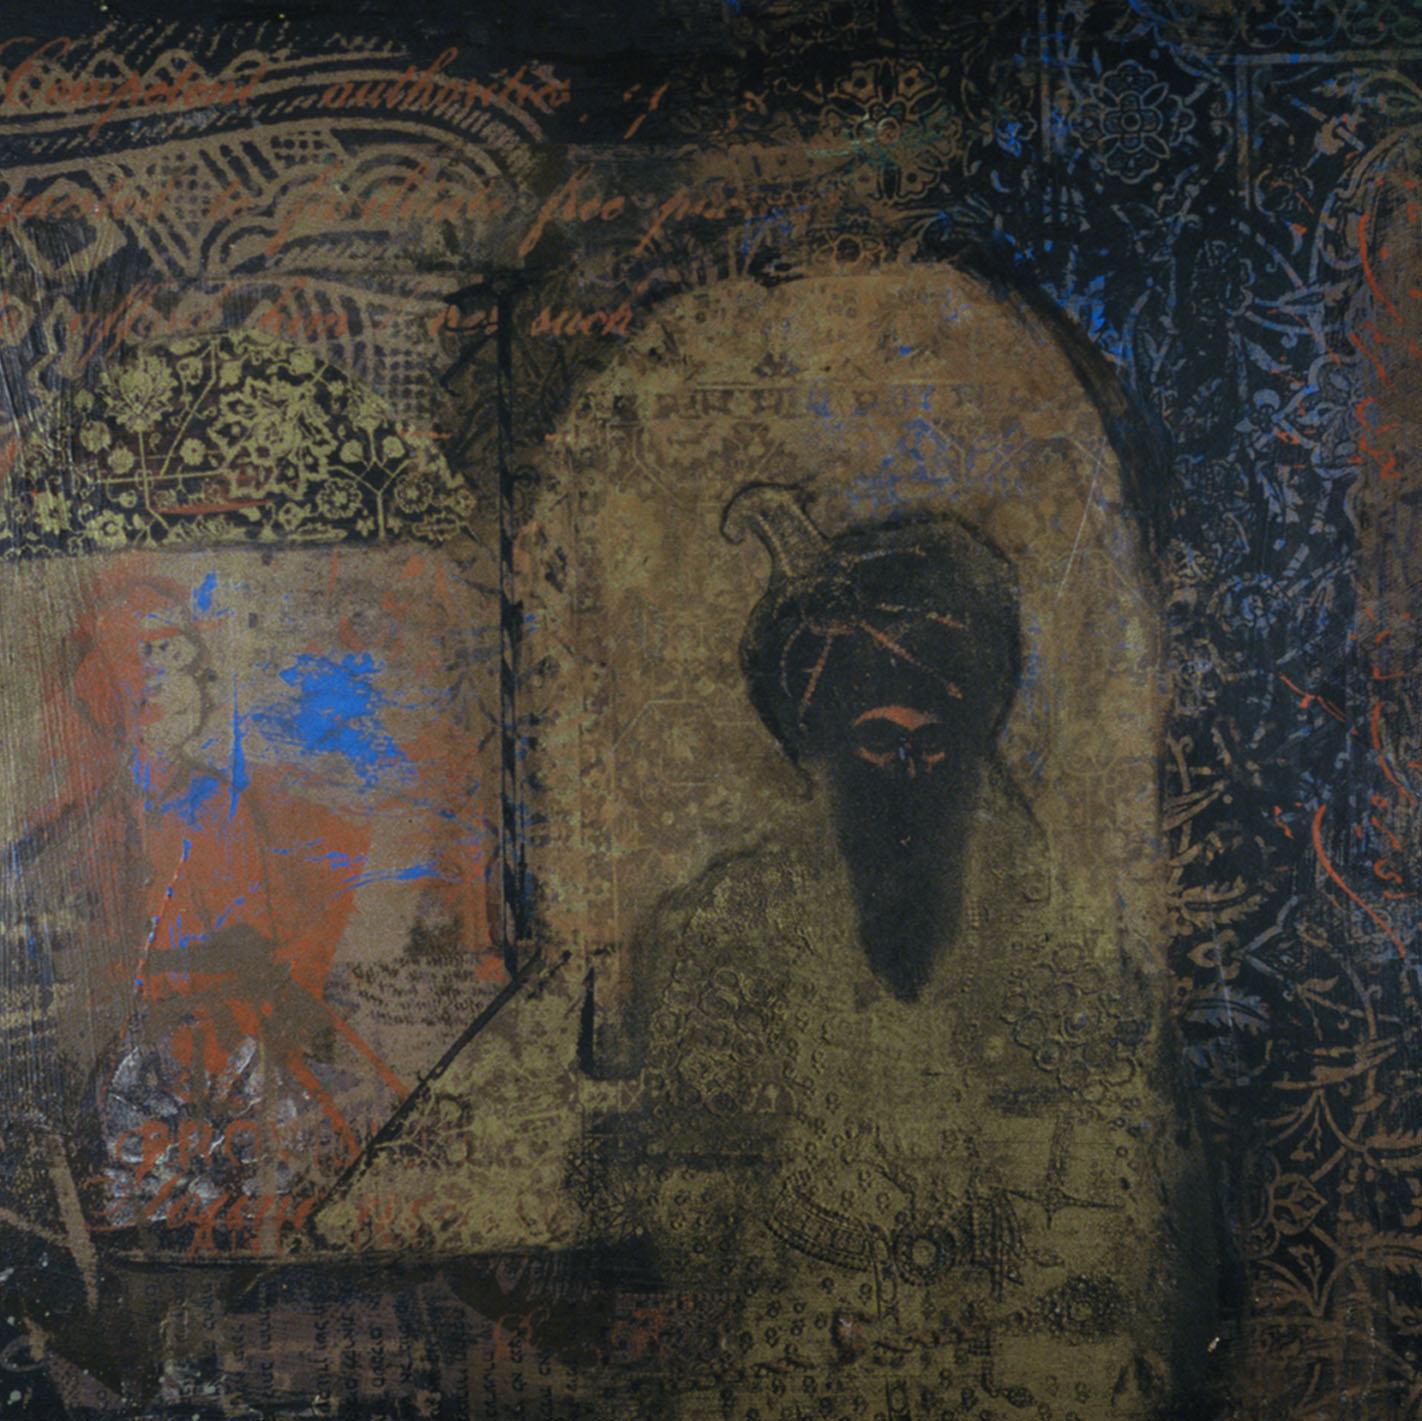 contemporary-iranian-art-ali-dadgar